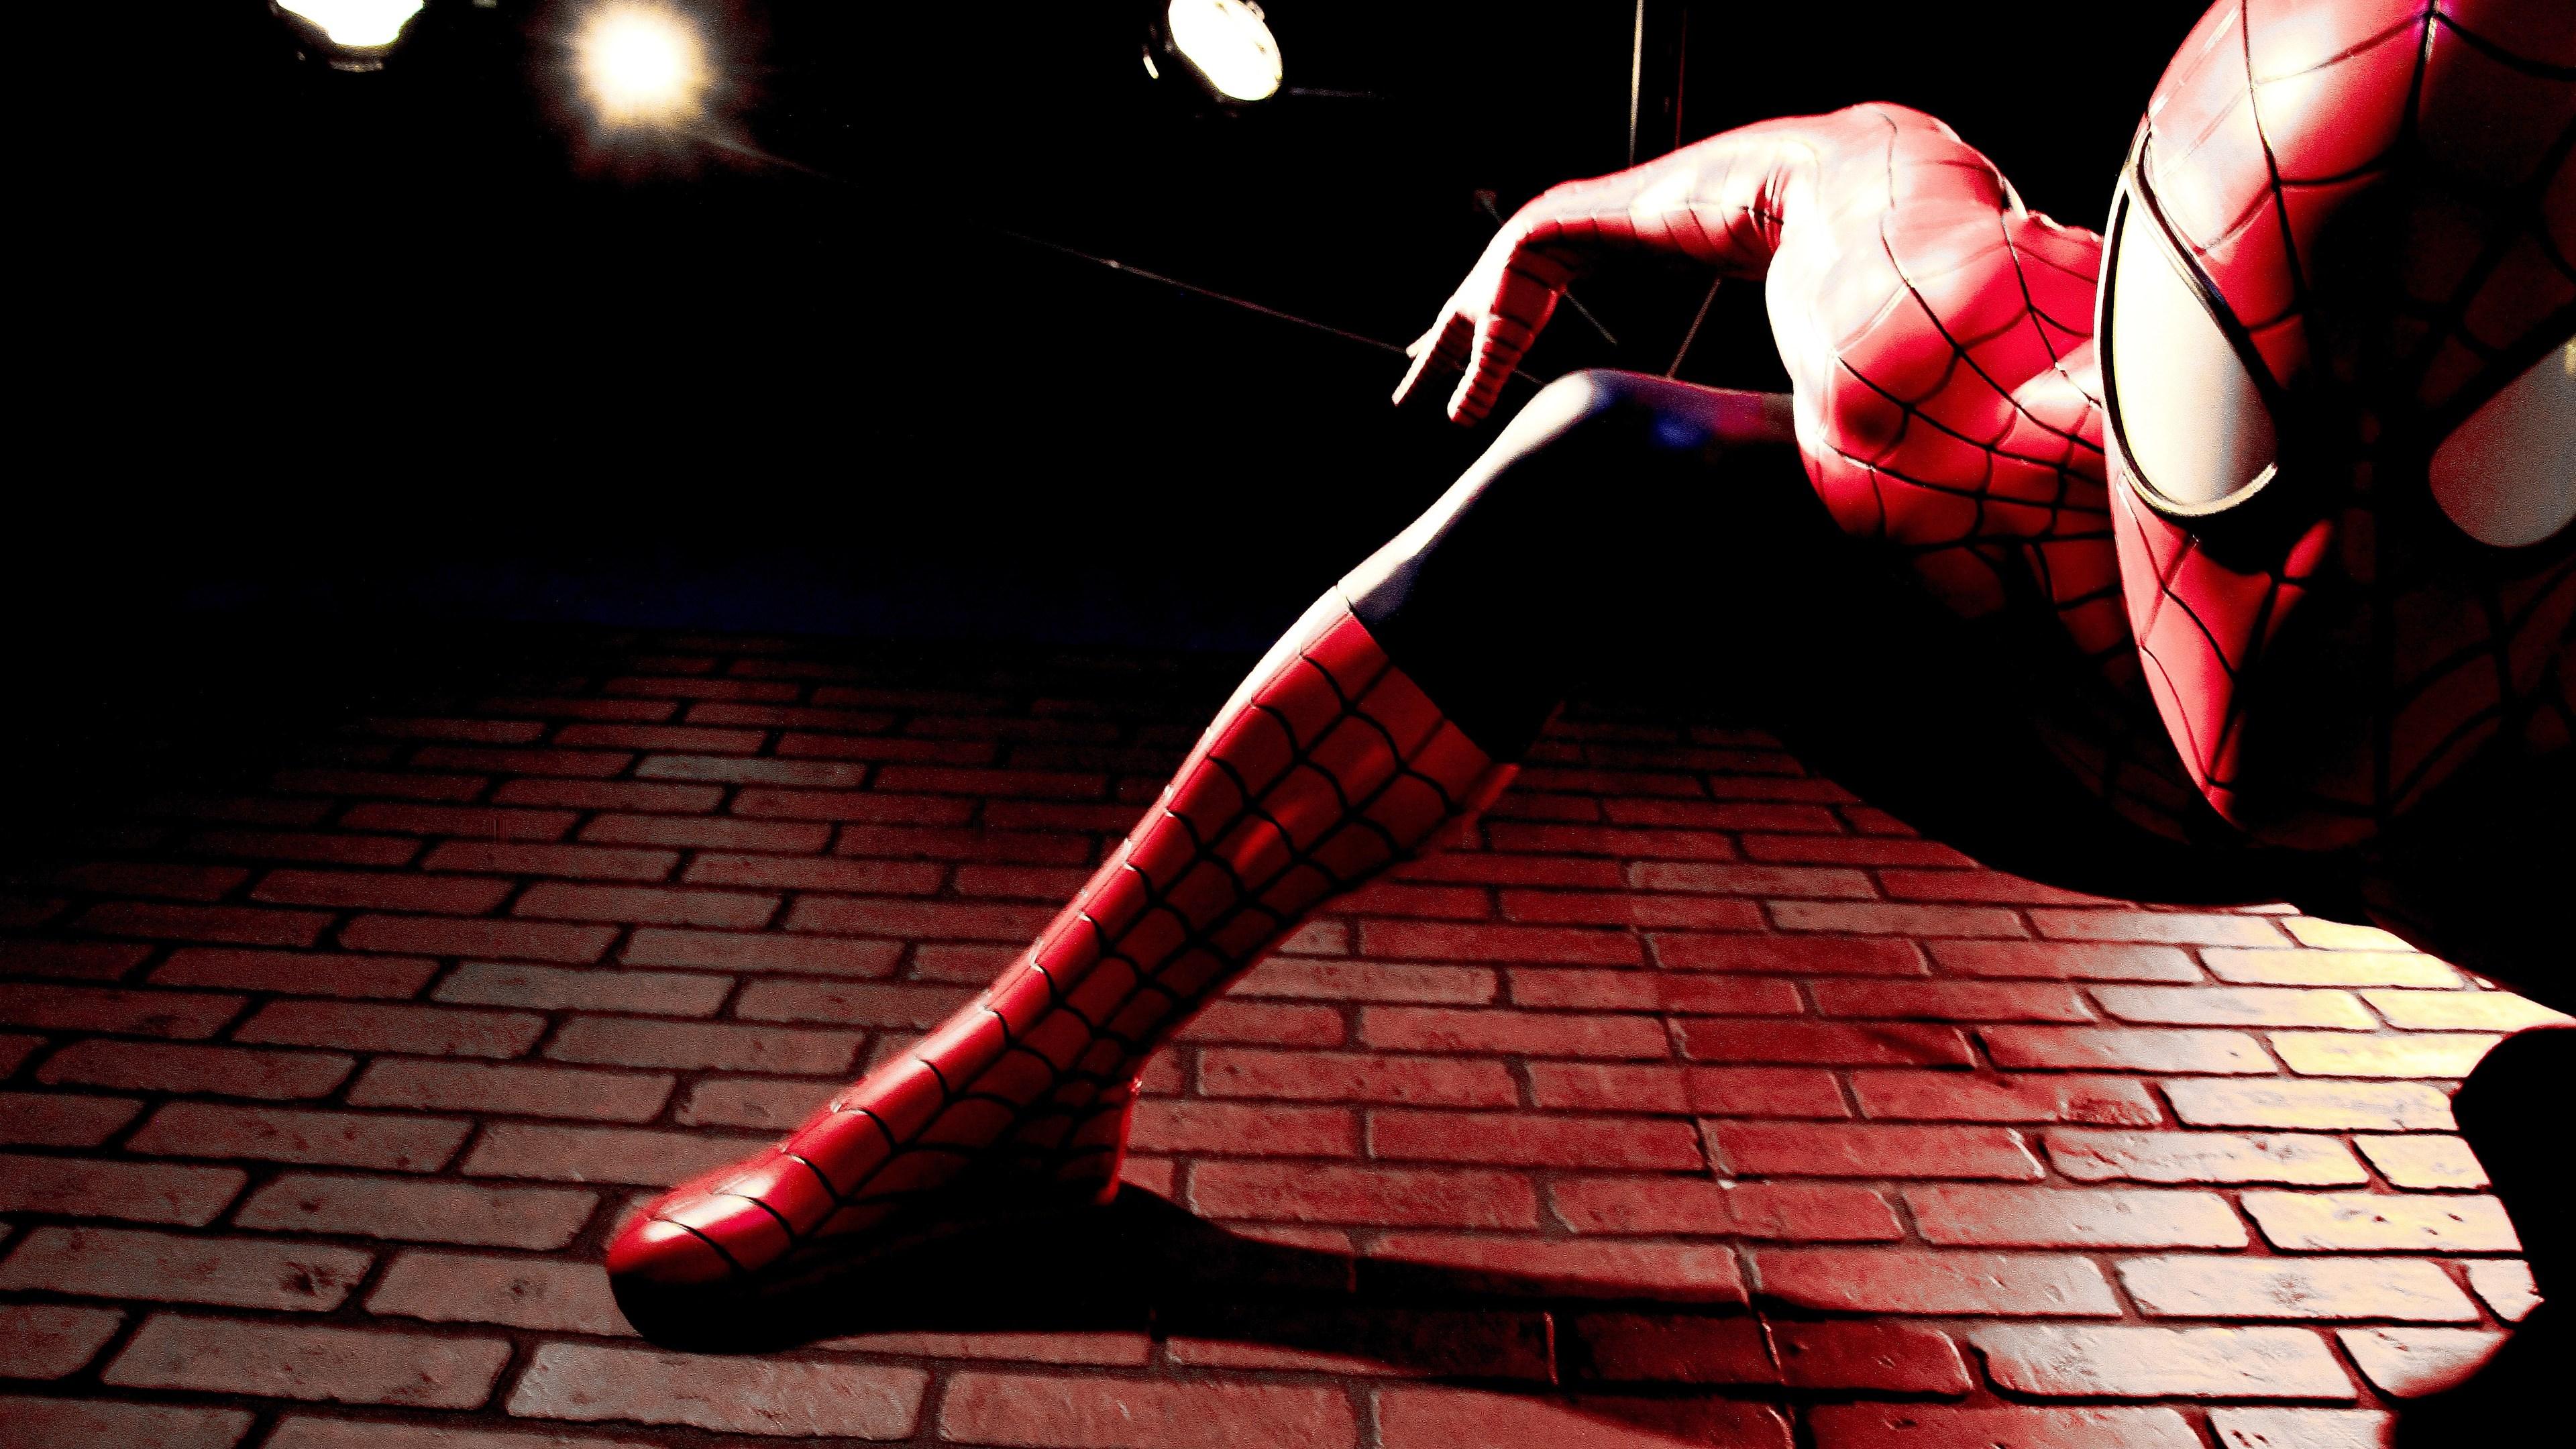 spider man cosplay 4k 1545588598 - Spider Man Cosplay 4k - superheroes wallpapers, spiderman wallpapers, hd-wallpapers, cosplay wallpapers, 5k wallpapers, 4k-wallpapers